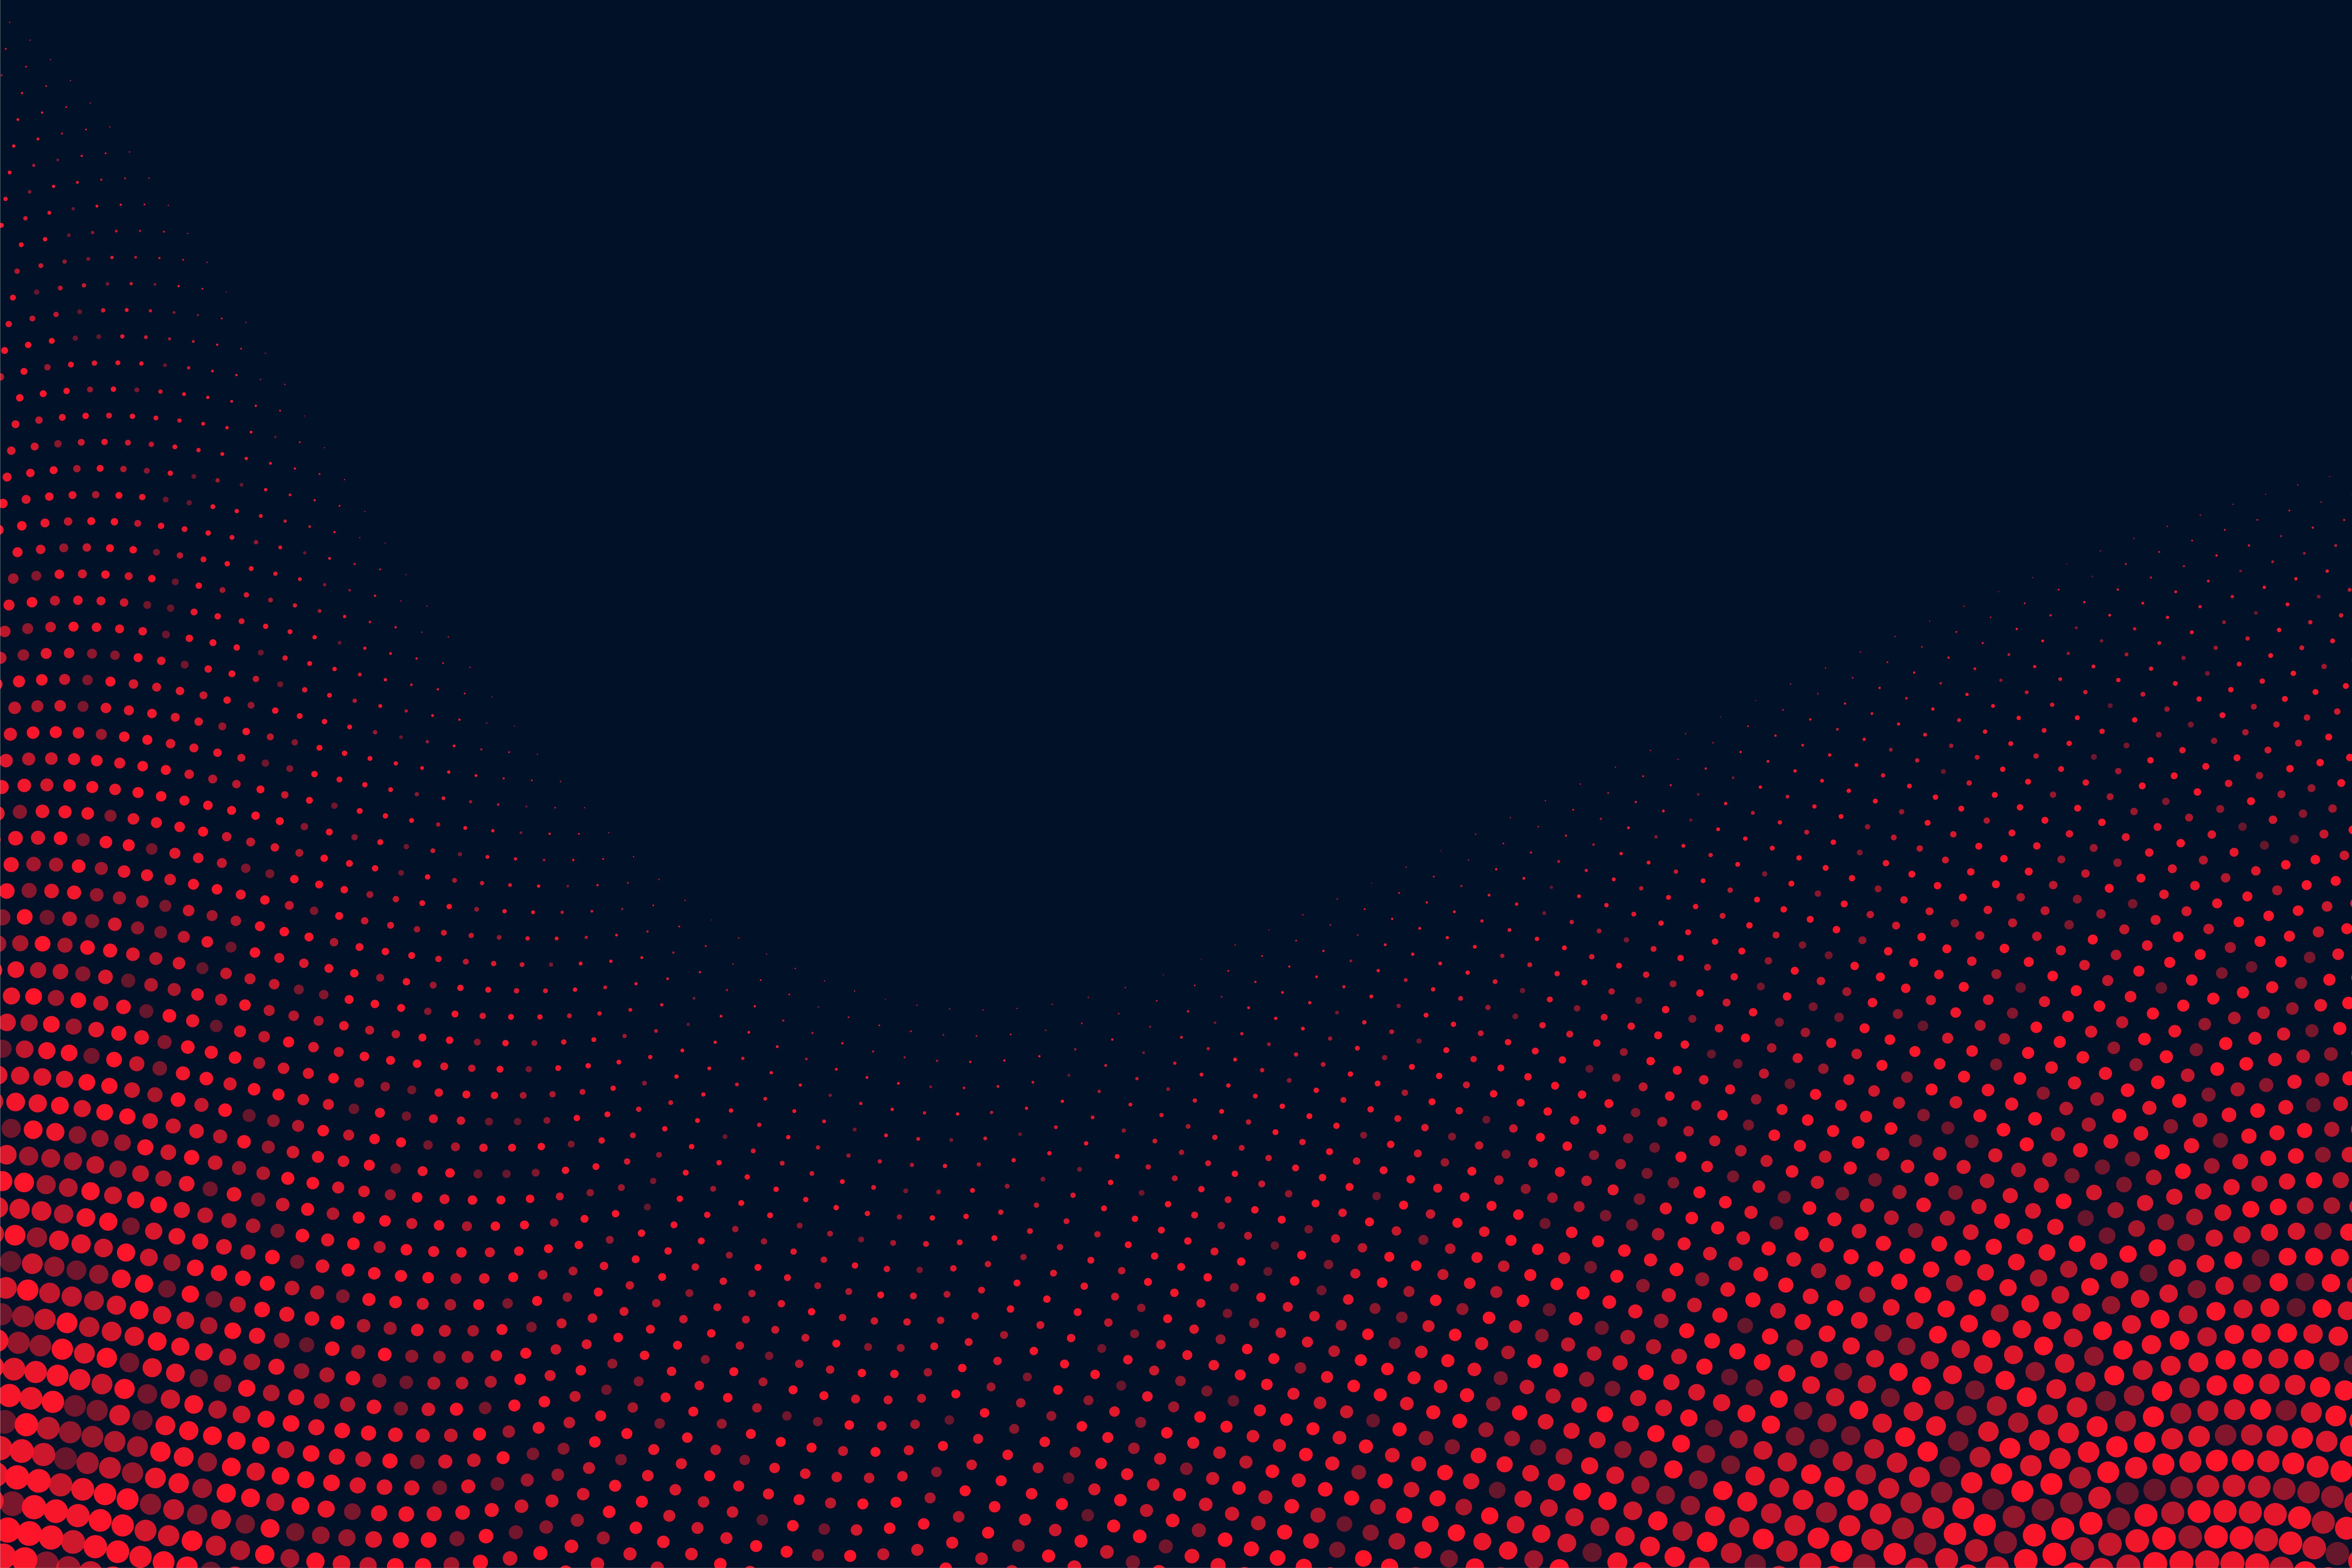 Abstract Halftone Gradient Background. Modern Look. 600363 Vector Art At  Vecteezy